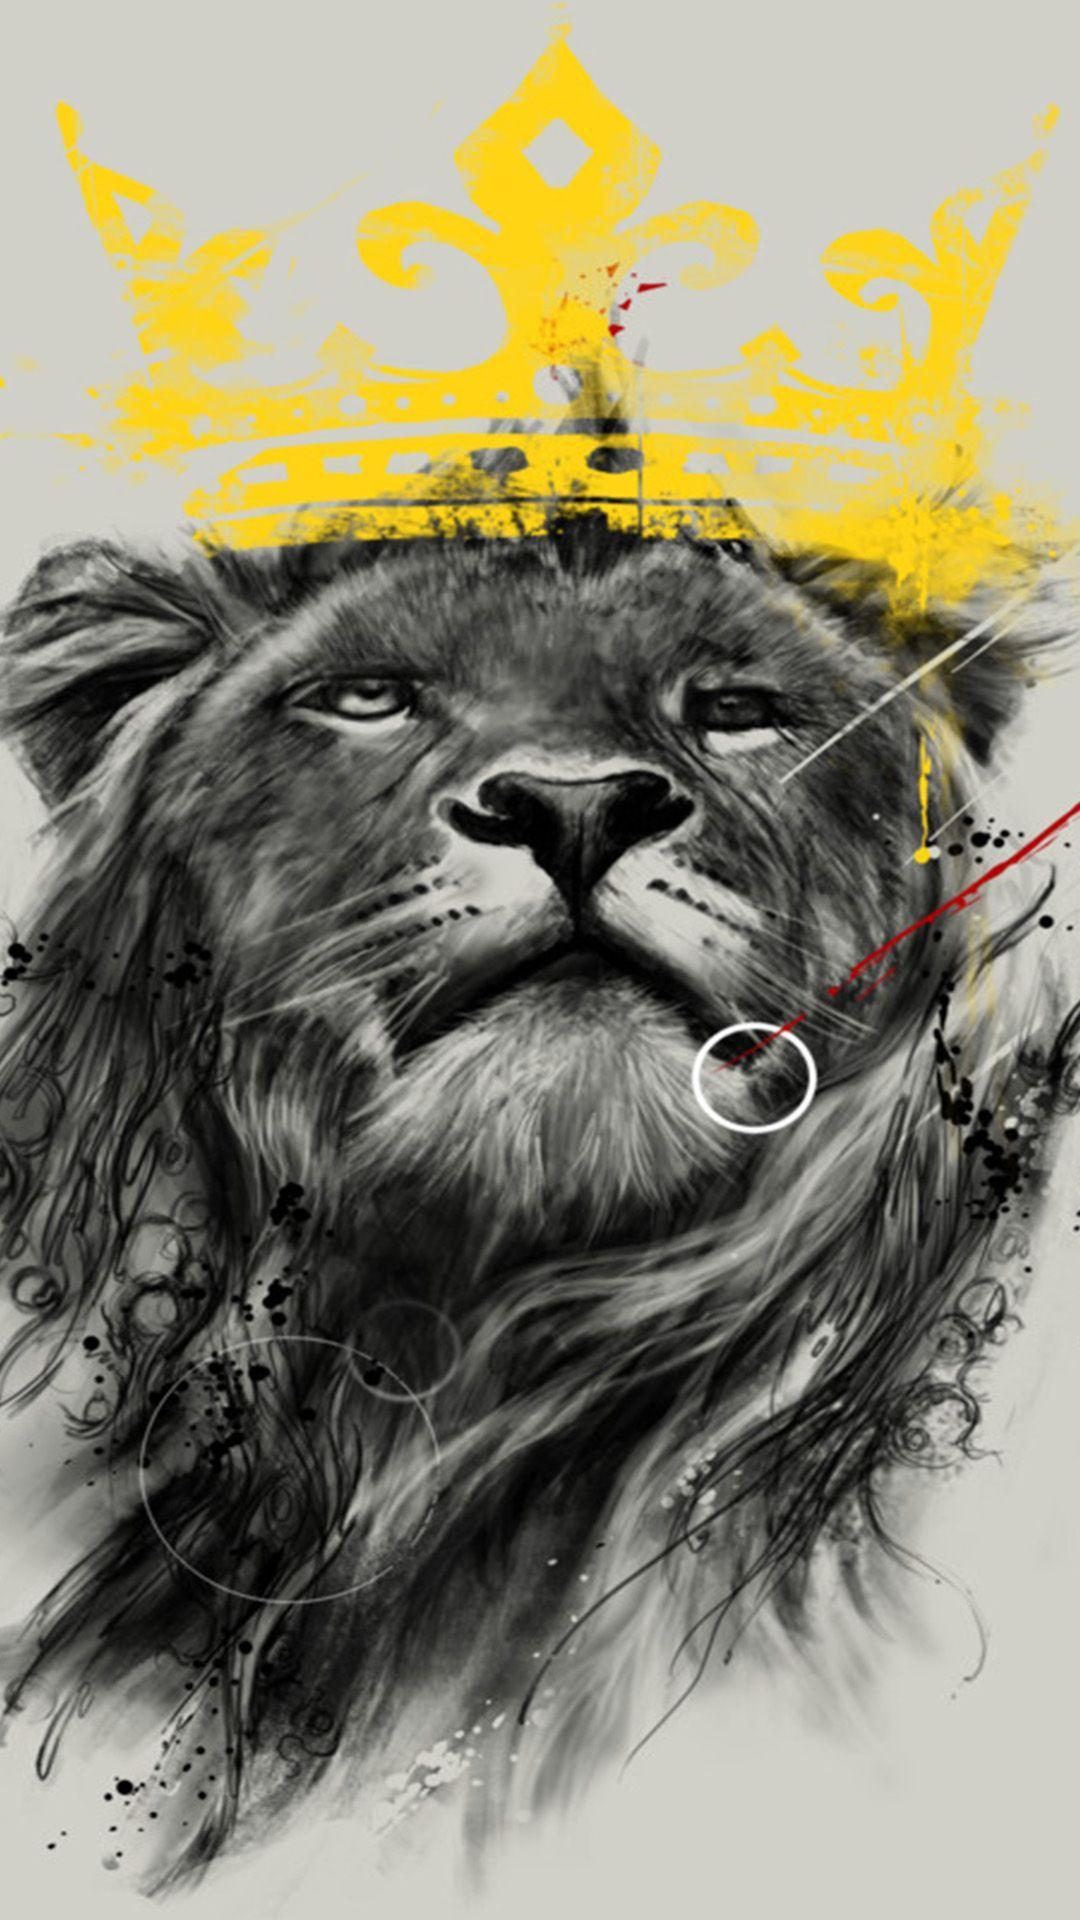 Lion King 4k Wallpapers